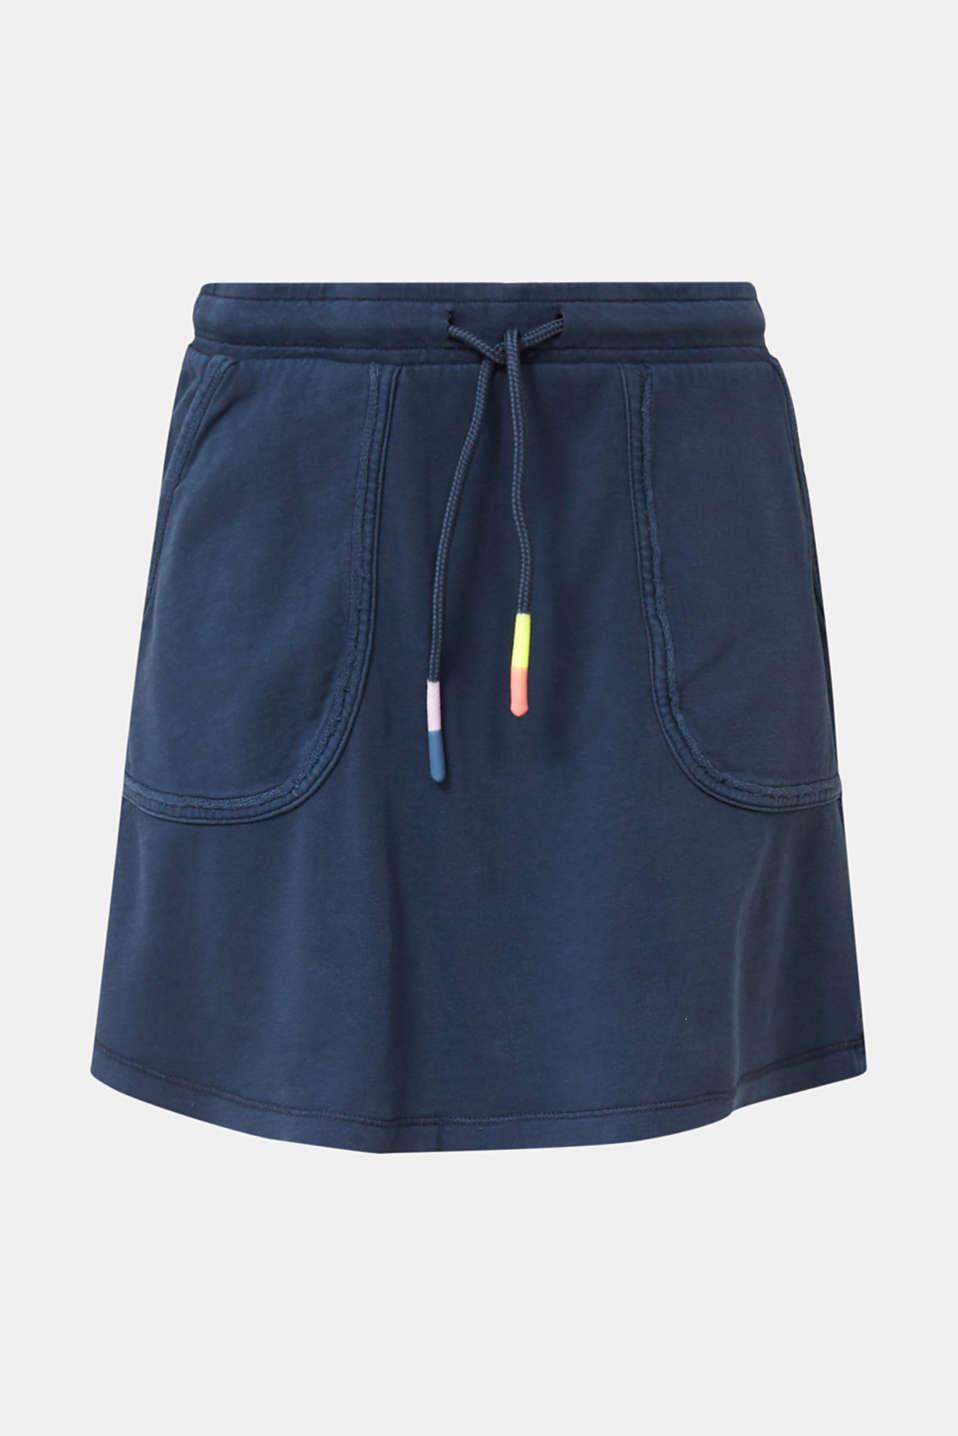 Sweatshirt fabric skirt made of cotton, NAVY, detail image number 5